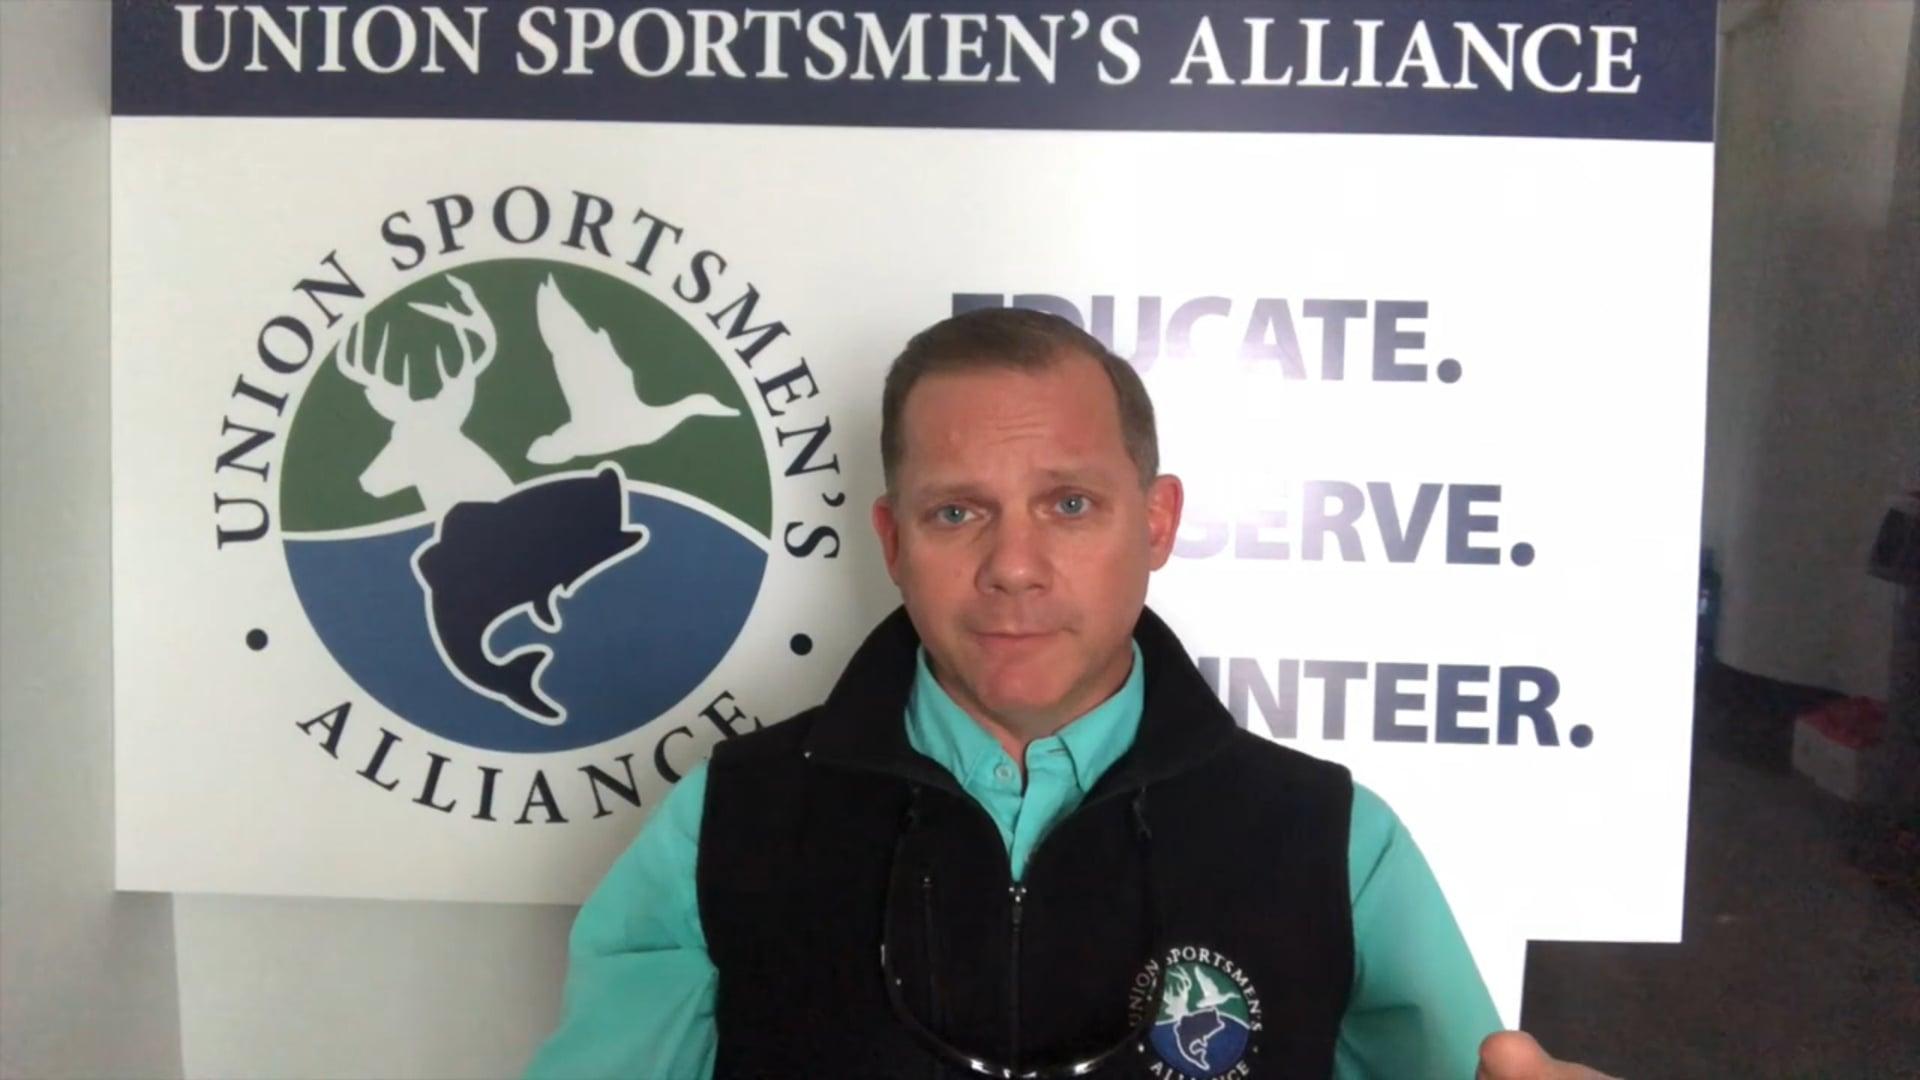 Scott Vance of Union Sportsmen's Alliance